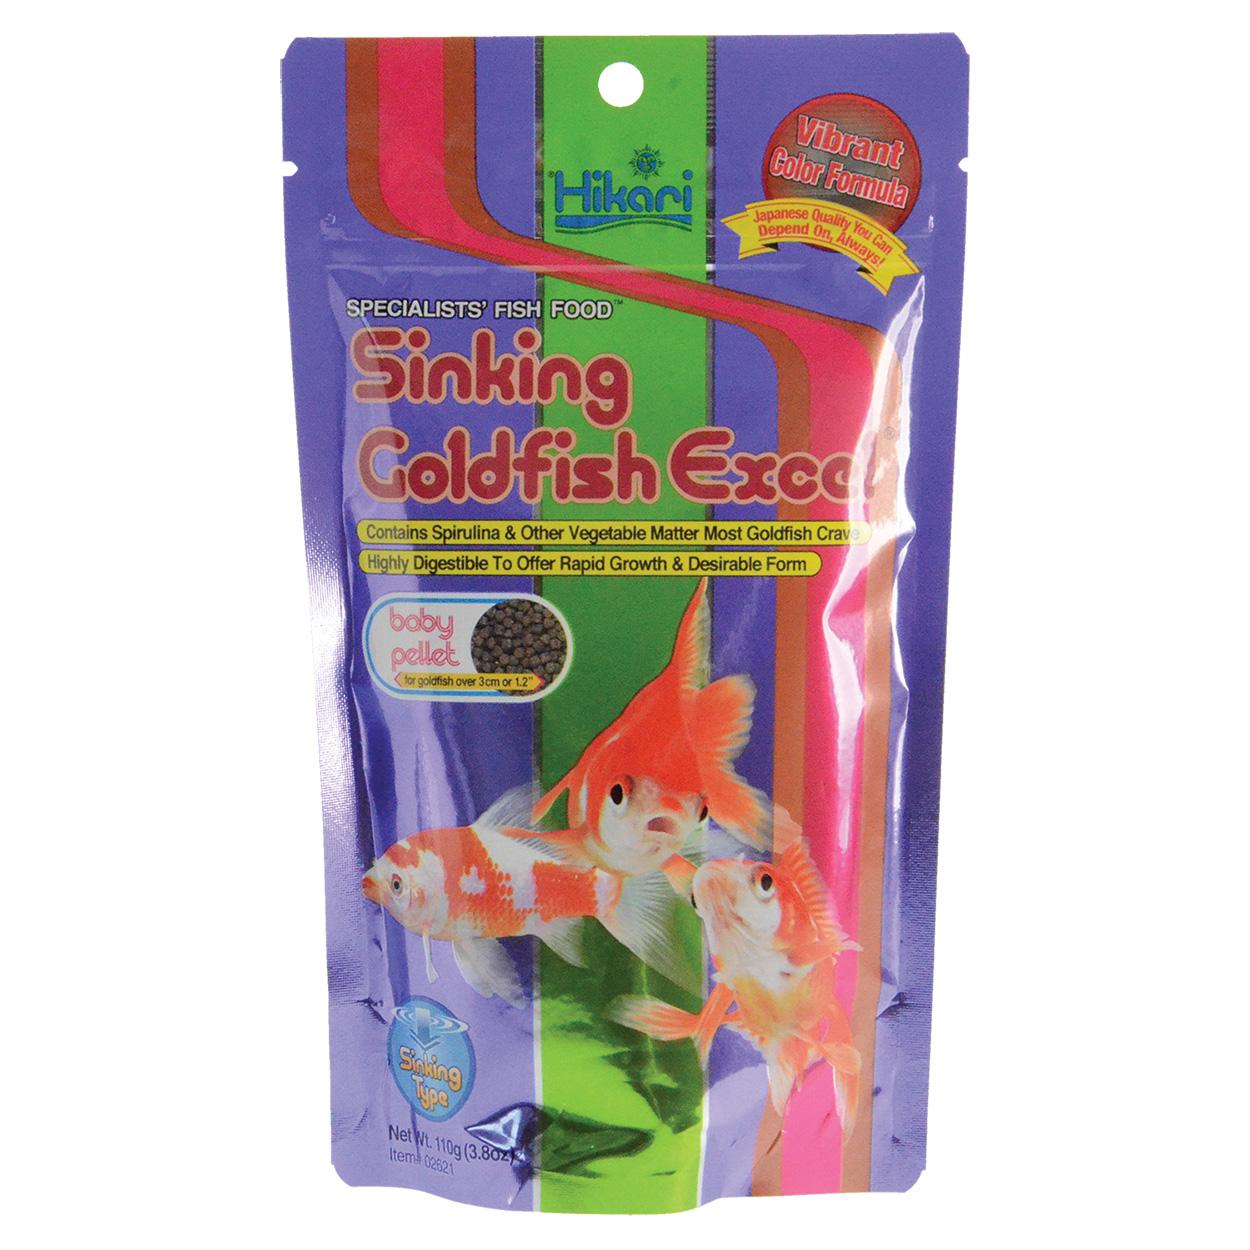 Hikari Sinking Goldfish Excel - Baby Pellets - 110 g 69649